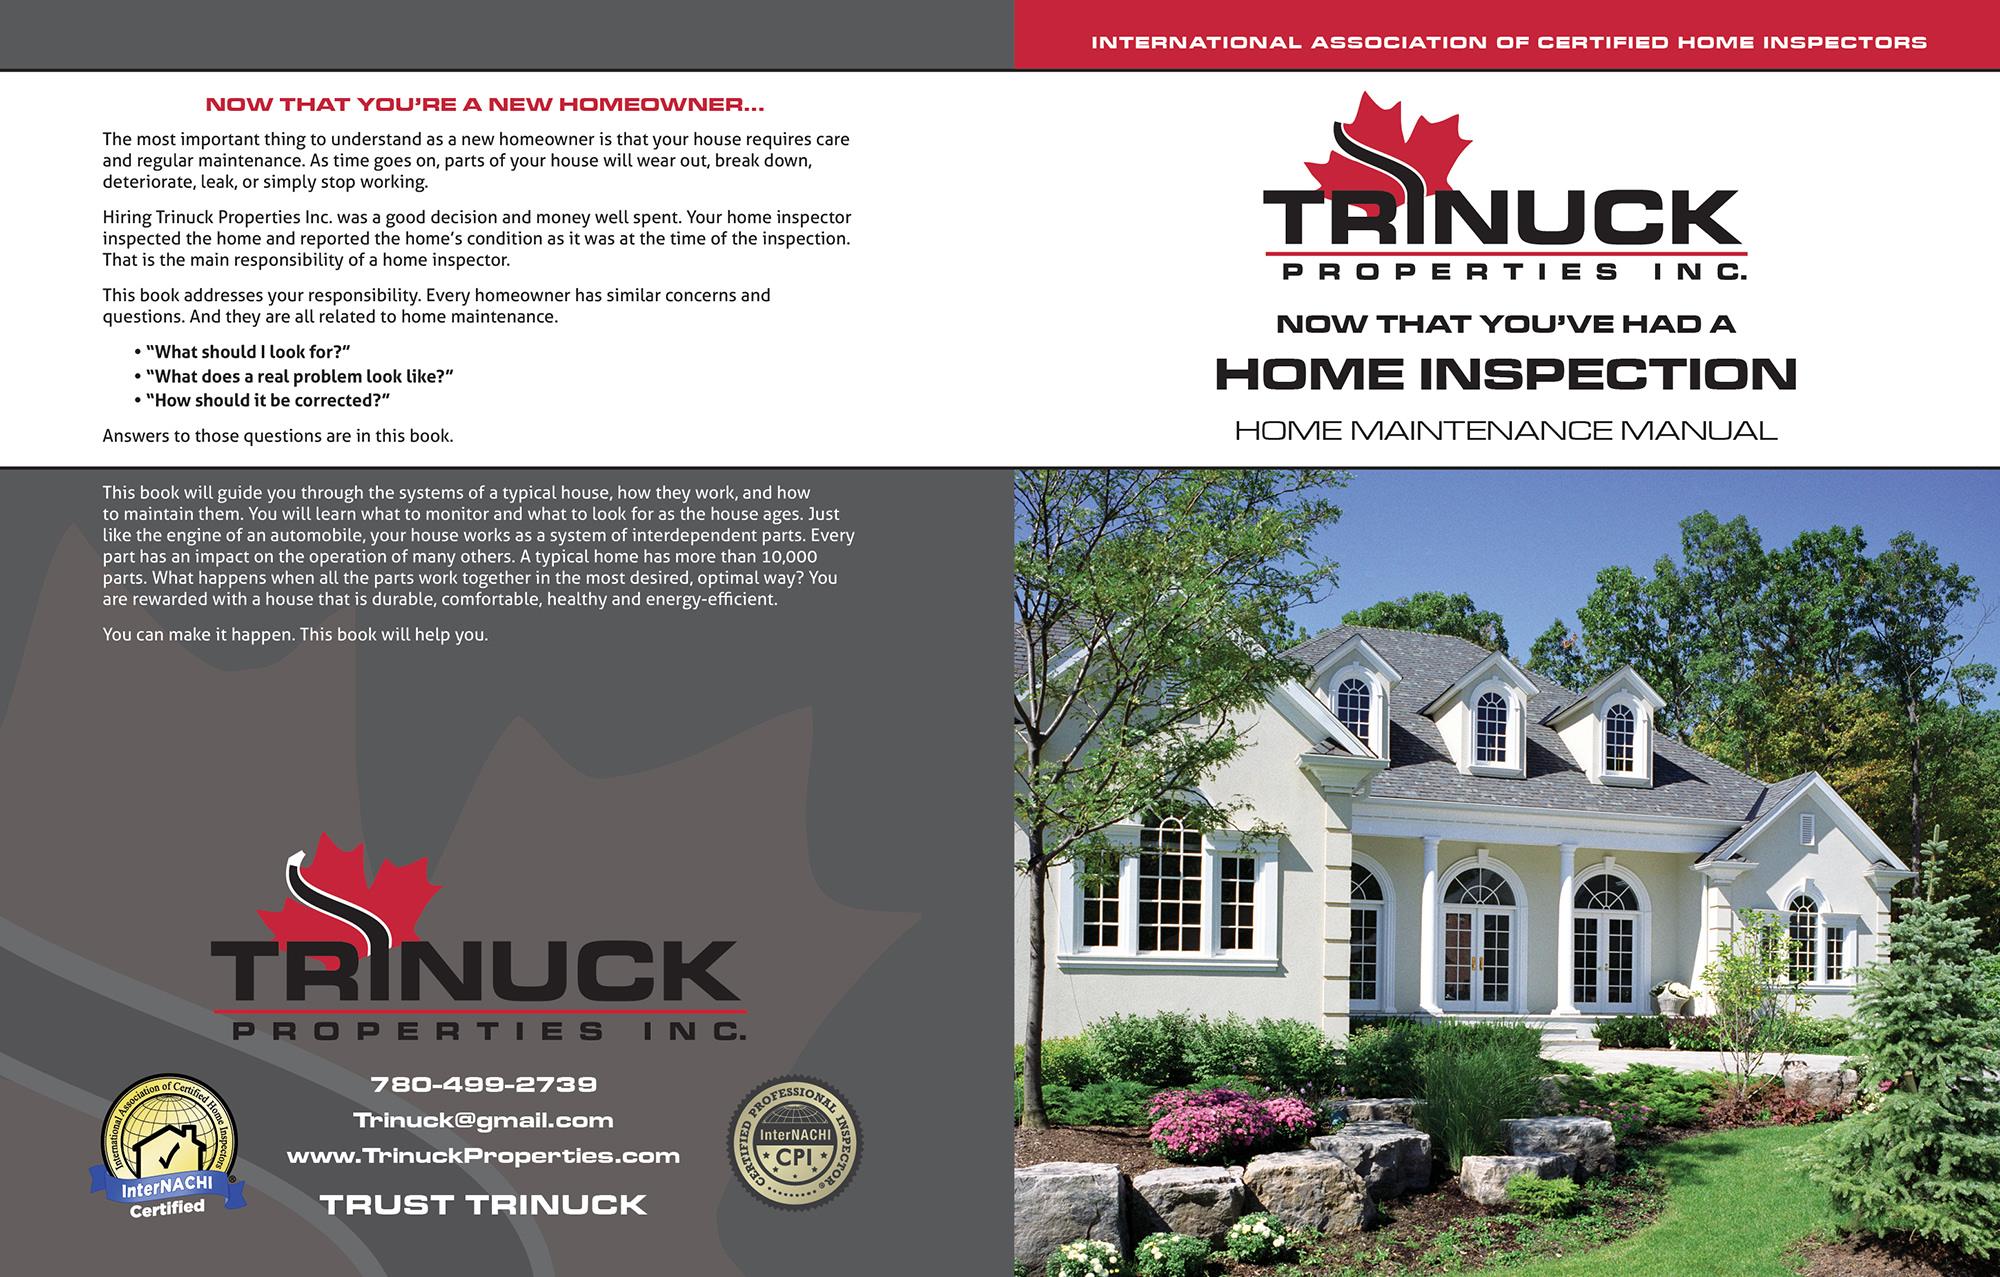 Custom Home Maintenance Book for Trinuck Properties